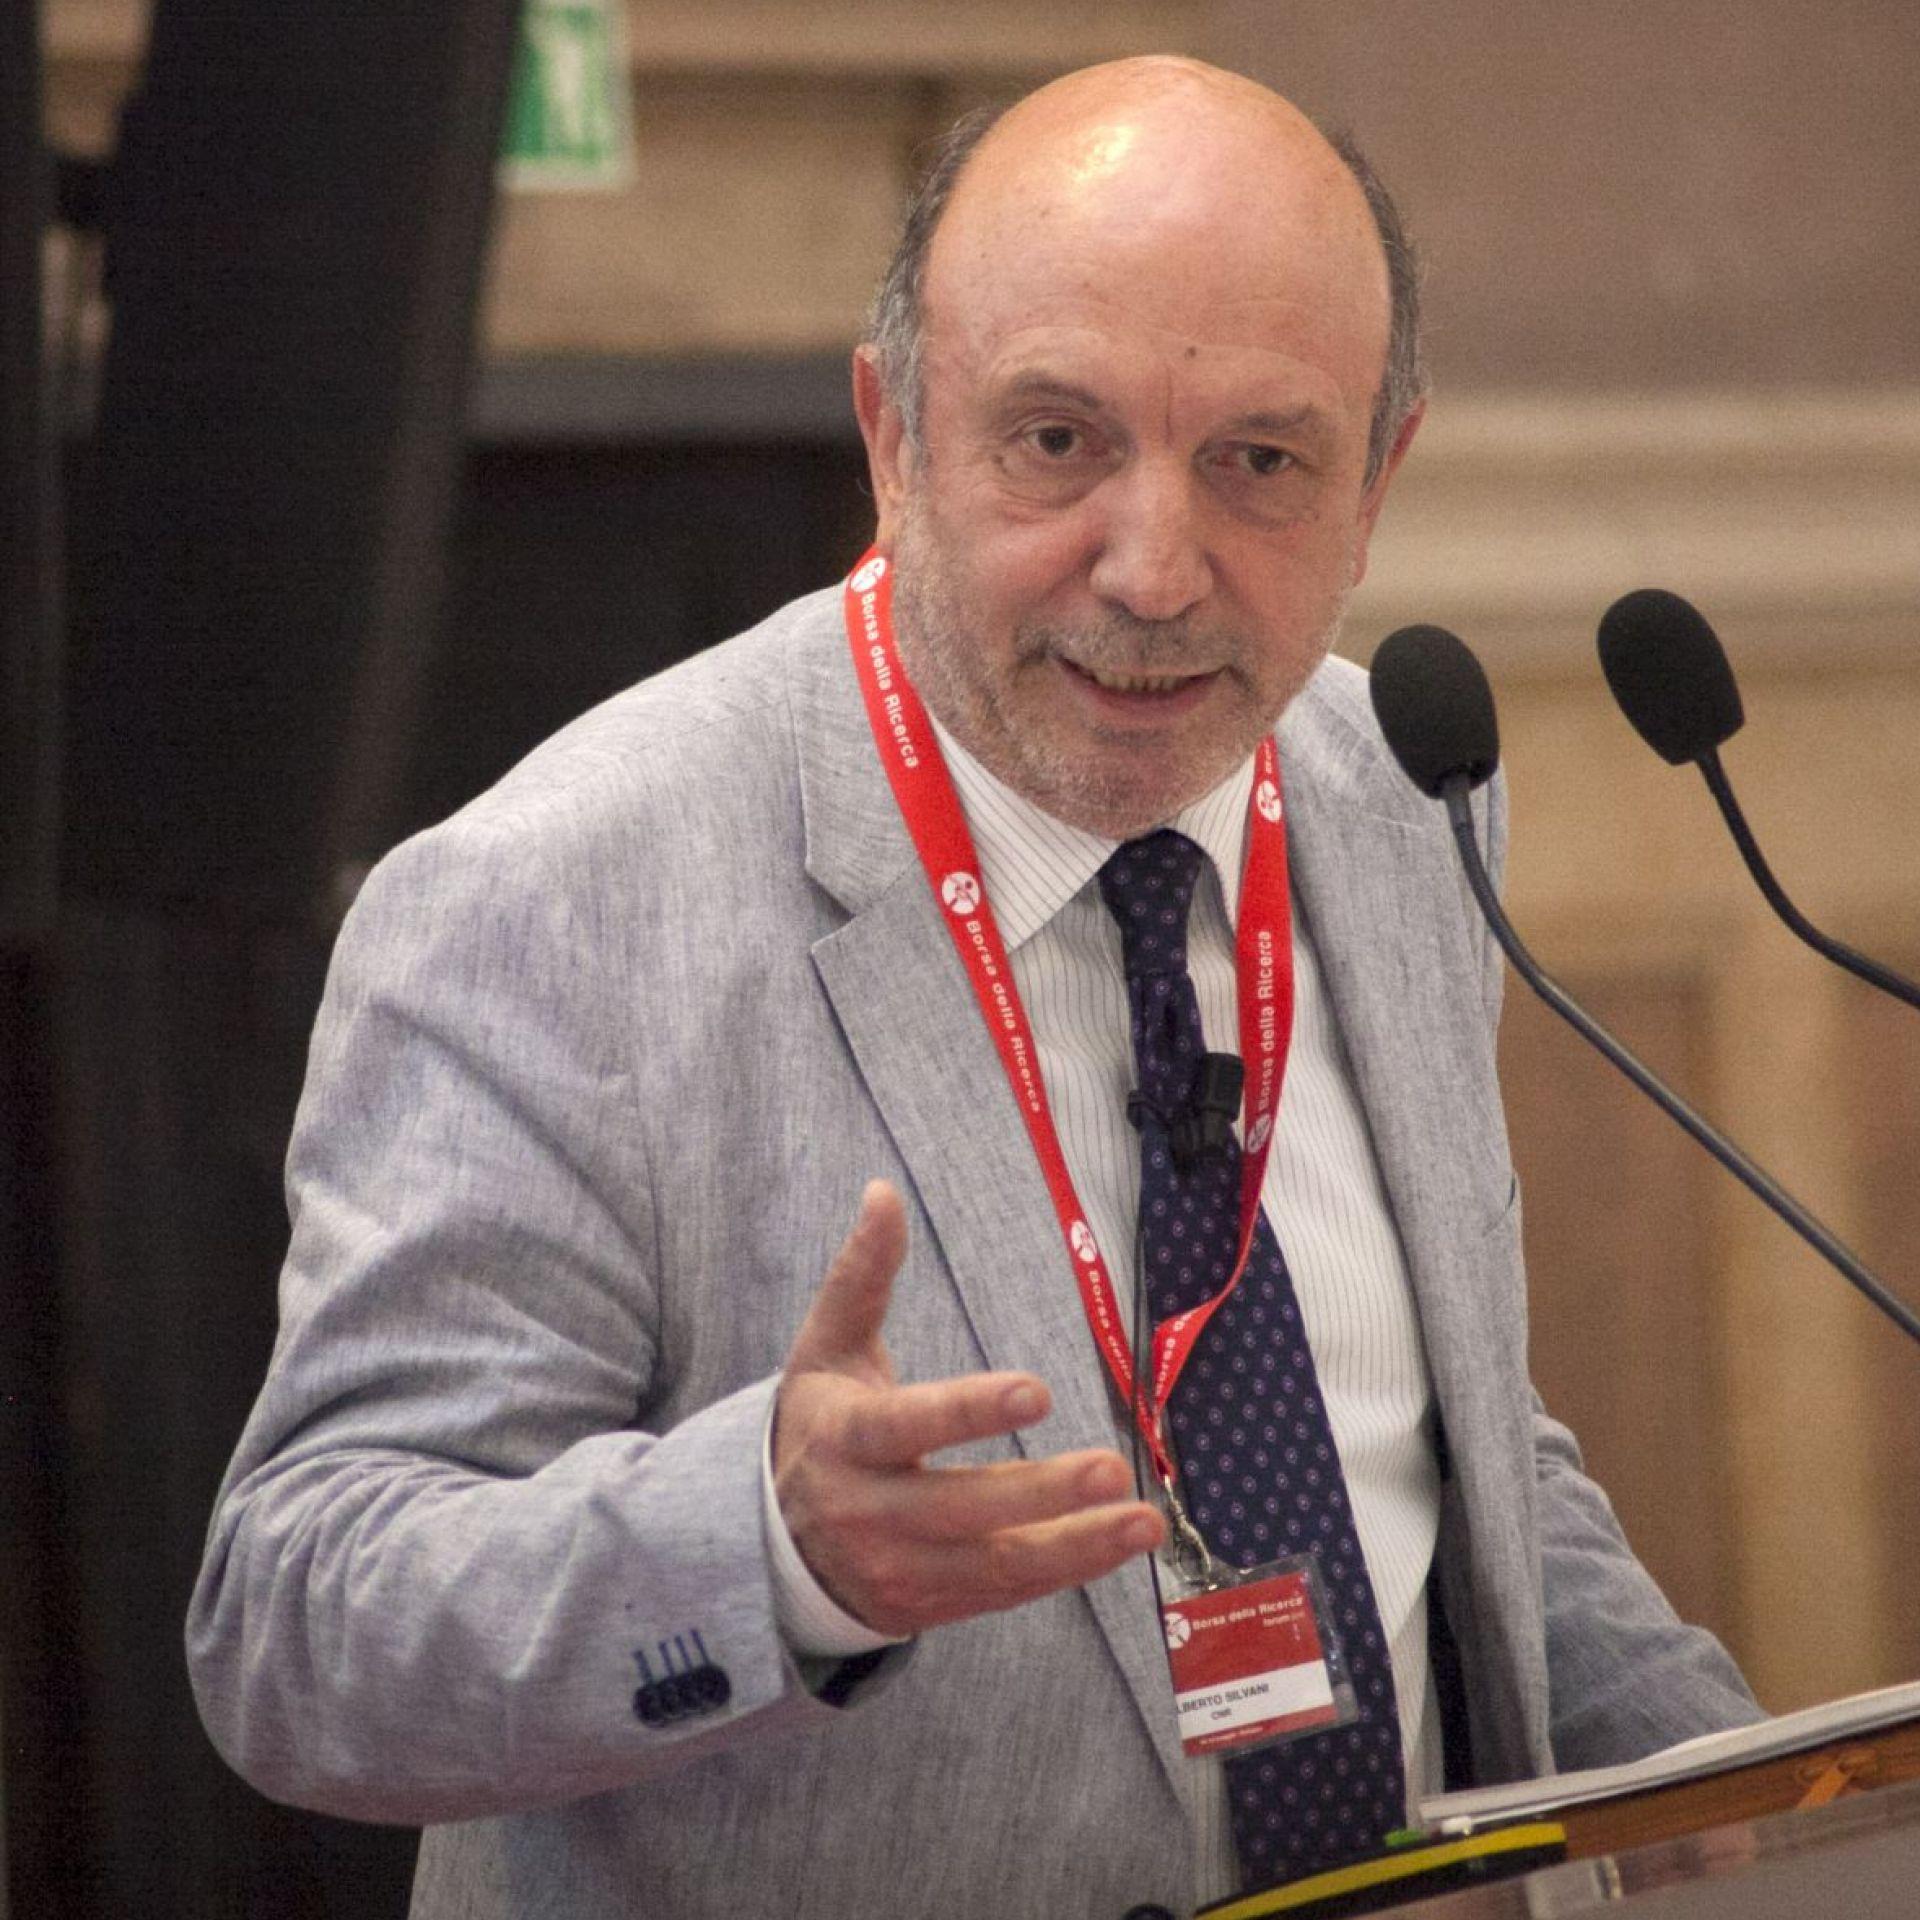 Alberto Silvani